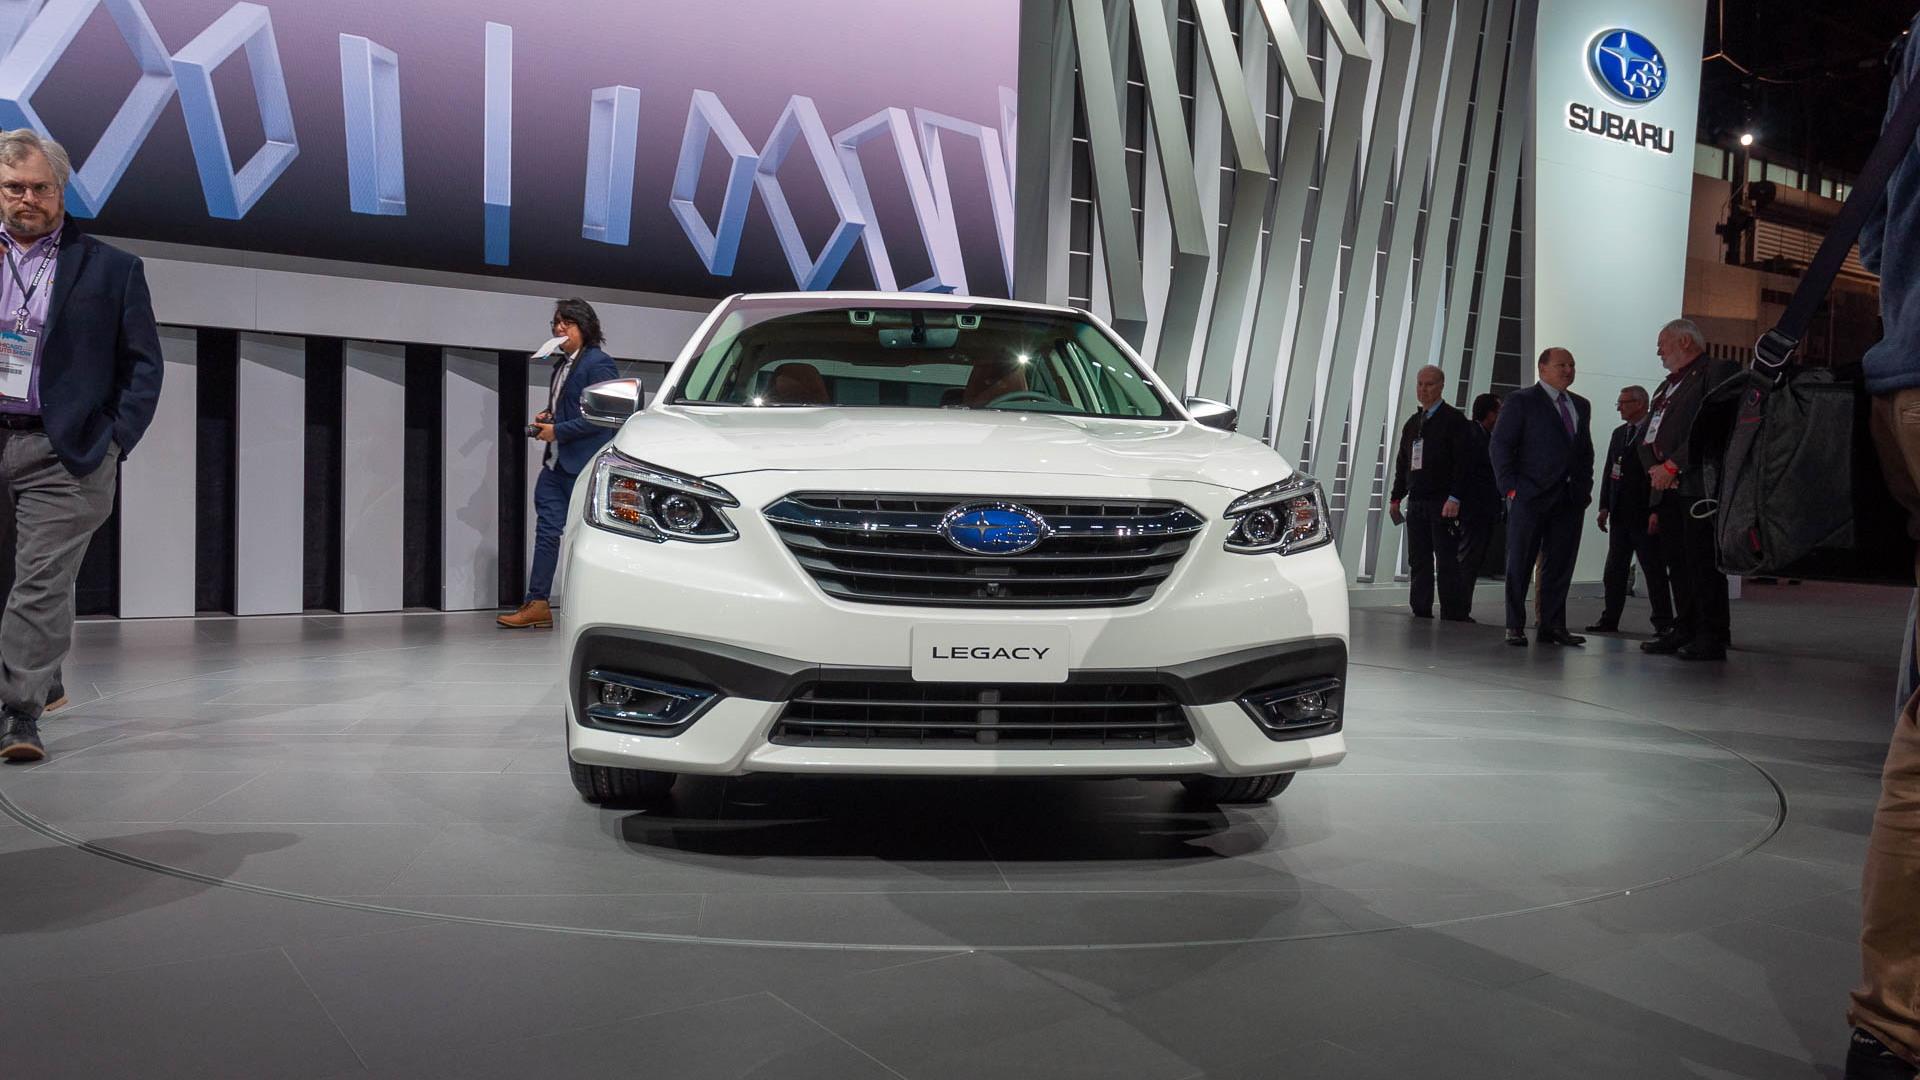 2020 Subaru Legacy, 2019 Chicago Auto Show